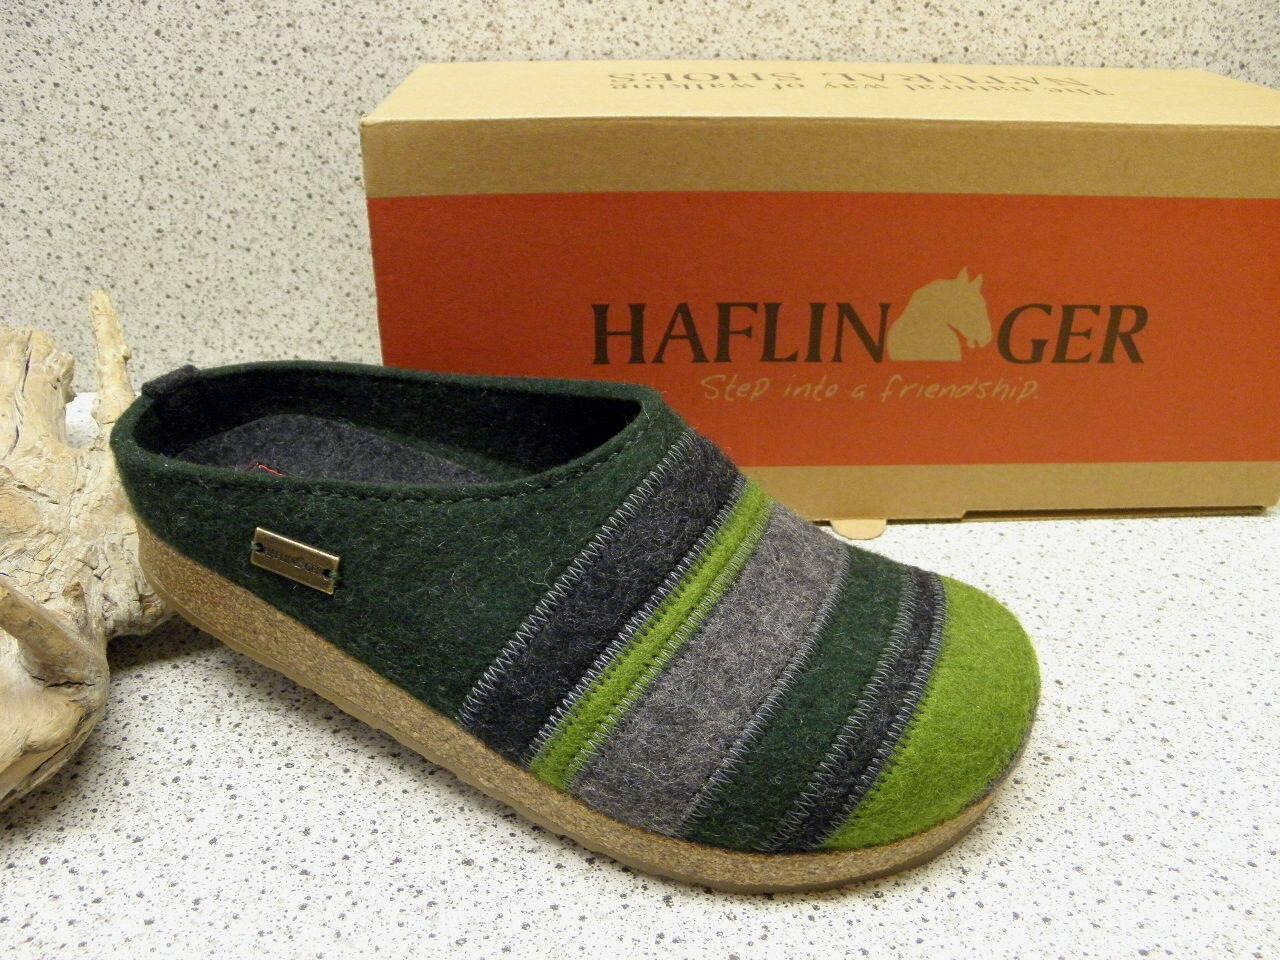 Haflinger ® rojouce hasta ahora 59,95 -  Grizzly Stripes lana (h82)